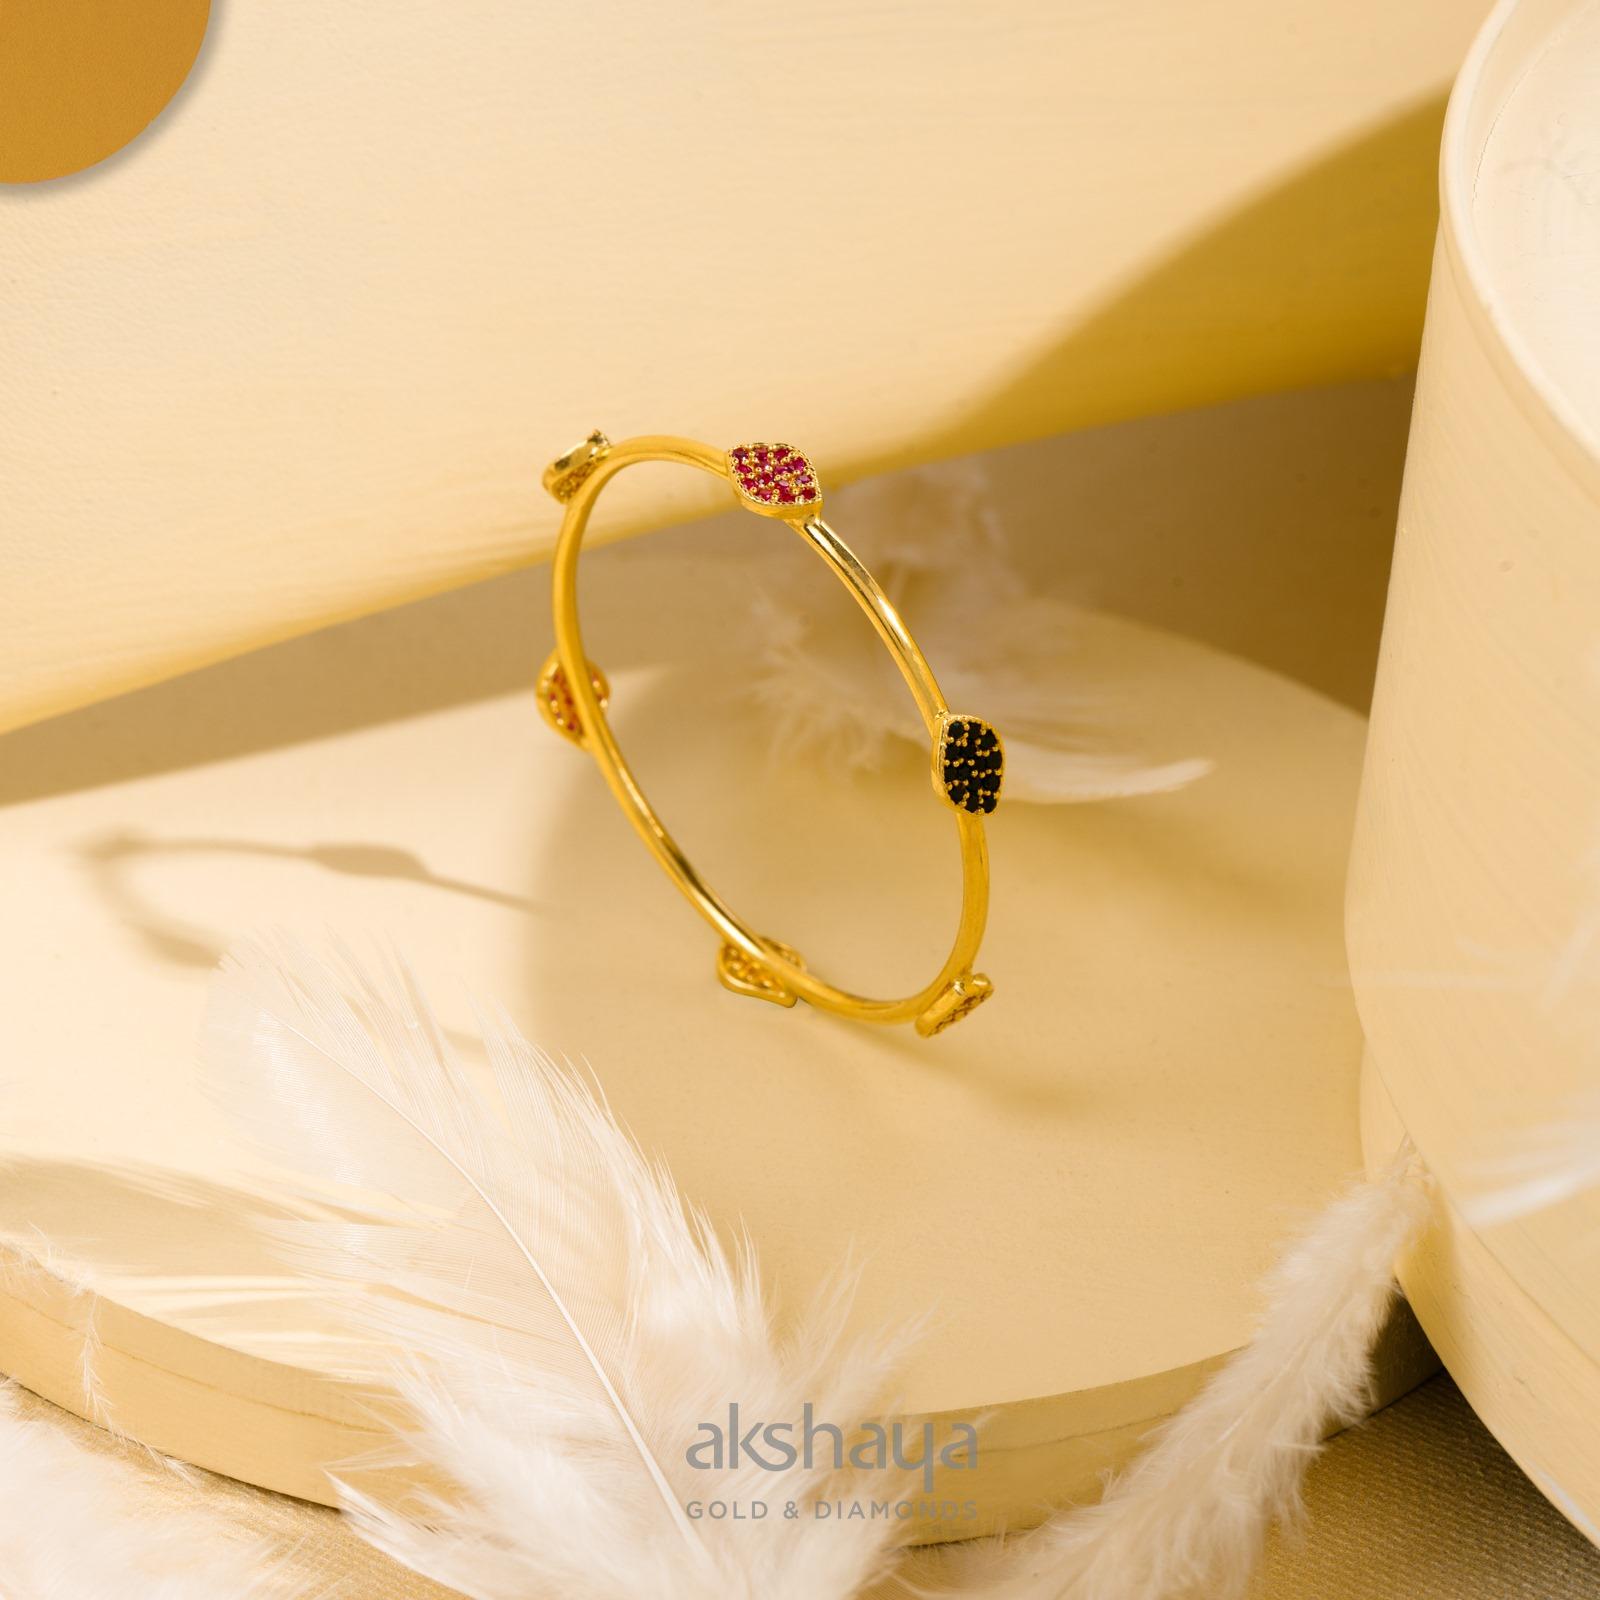 Akshaya Gold Bangle GL10328